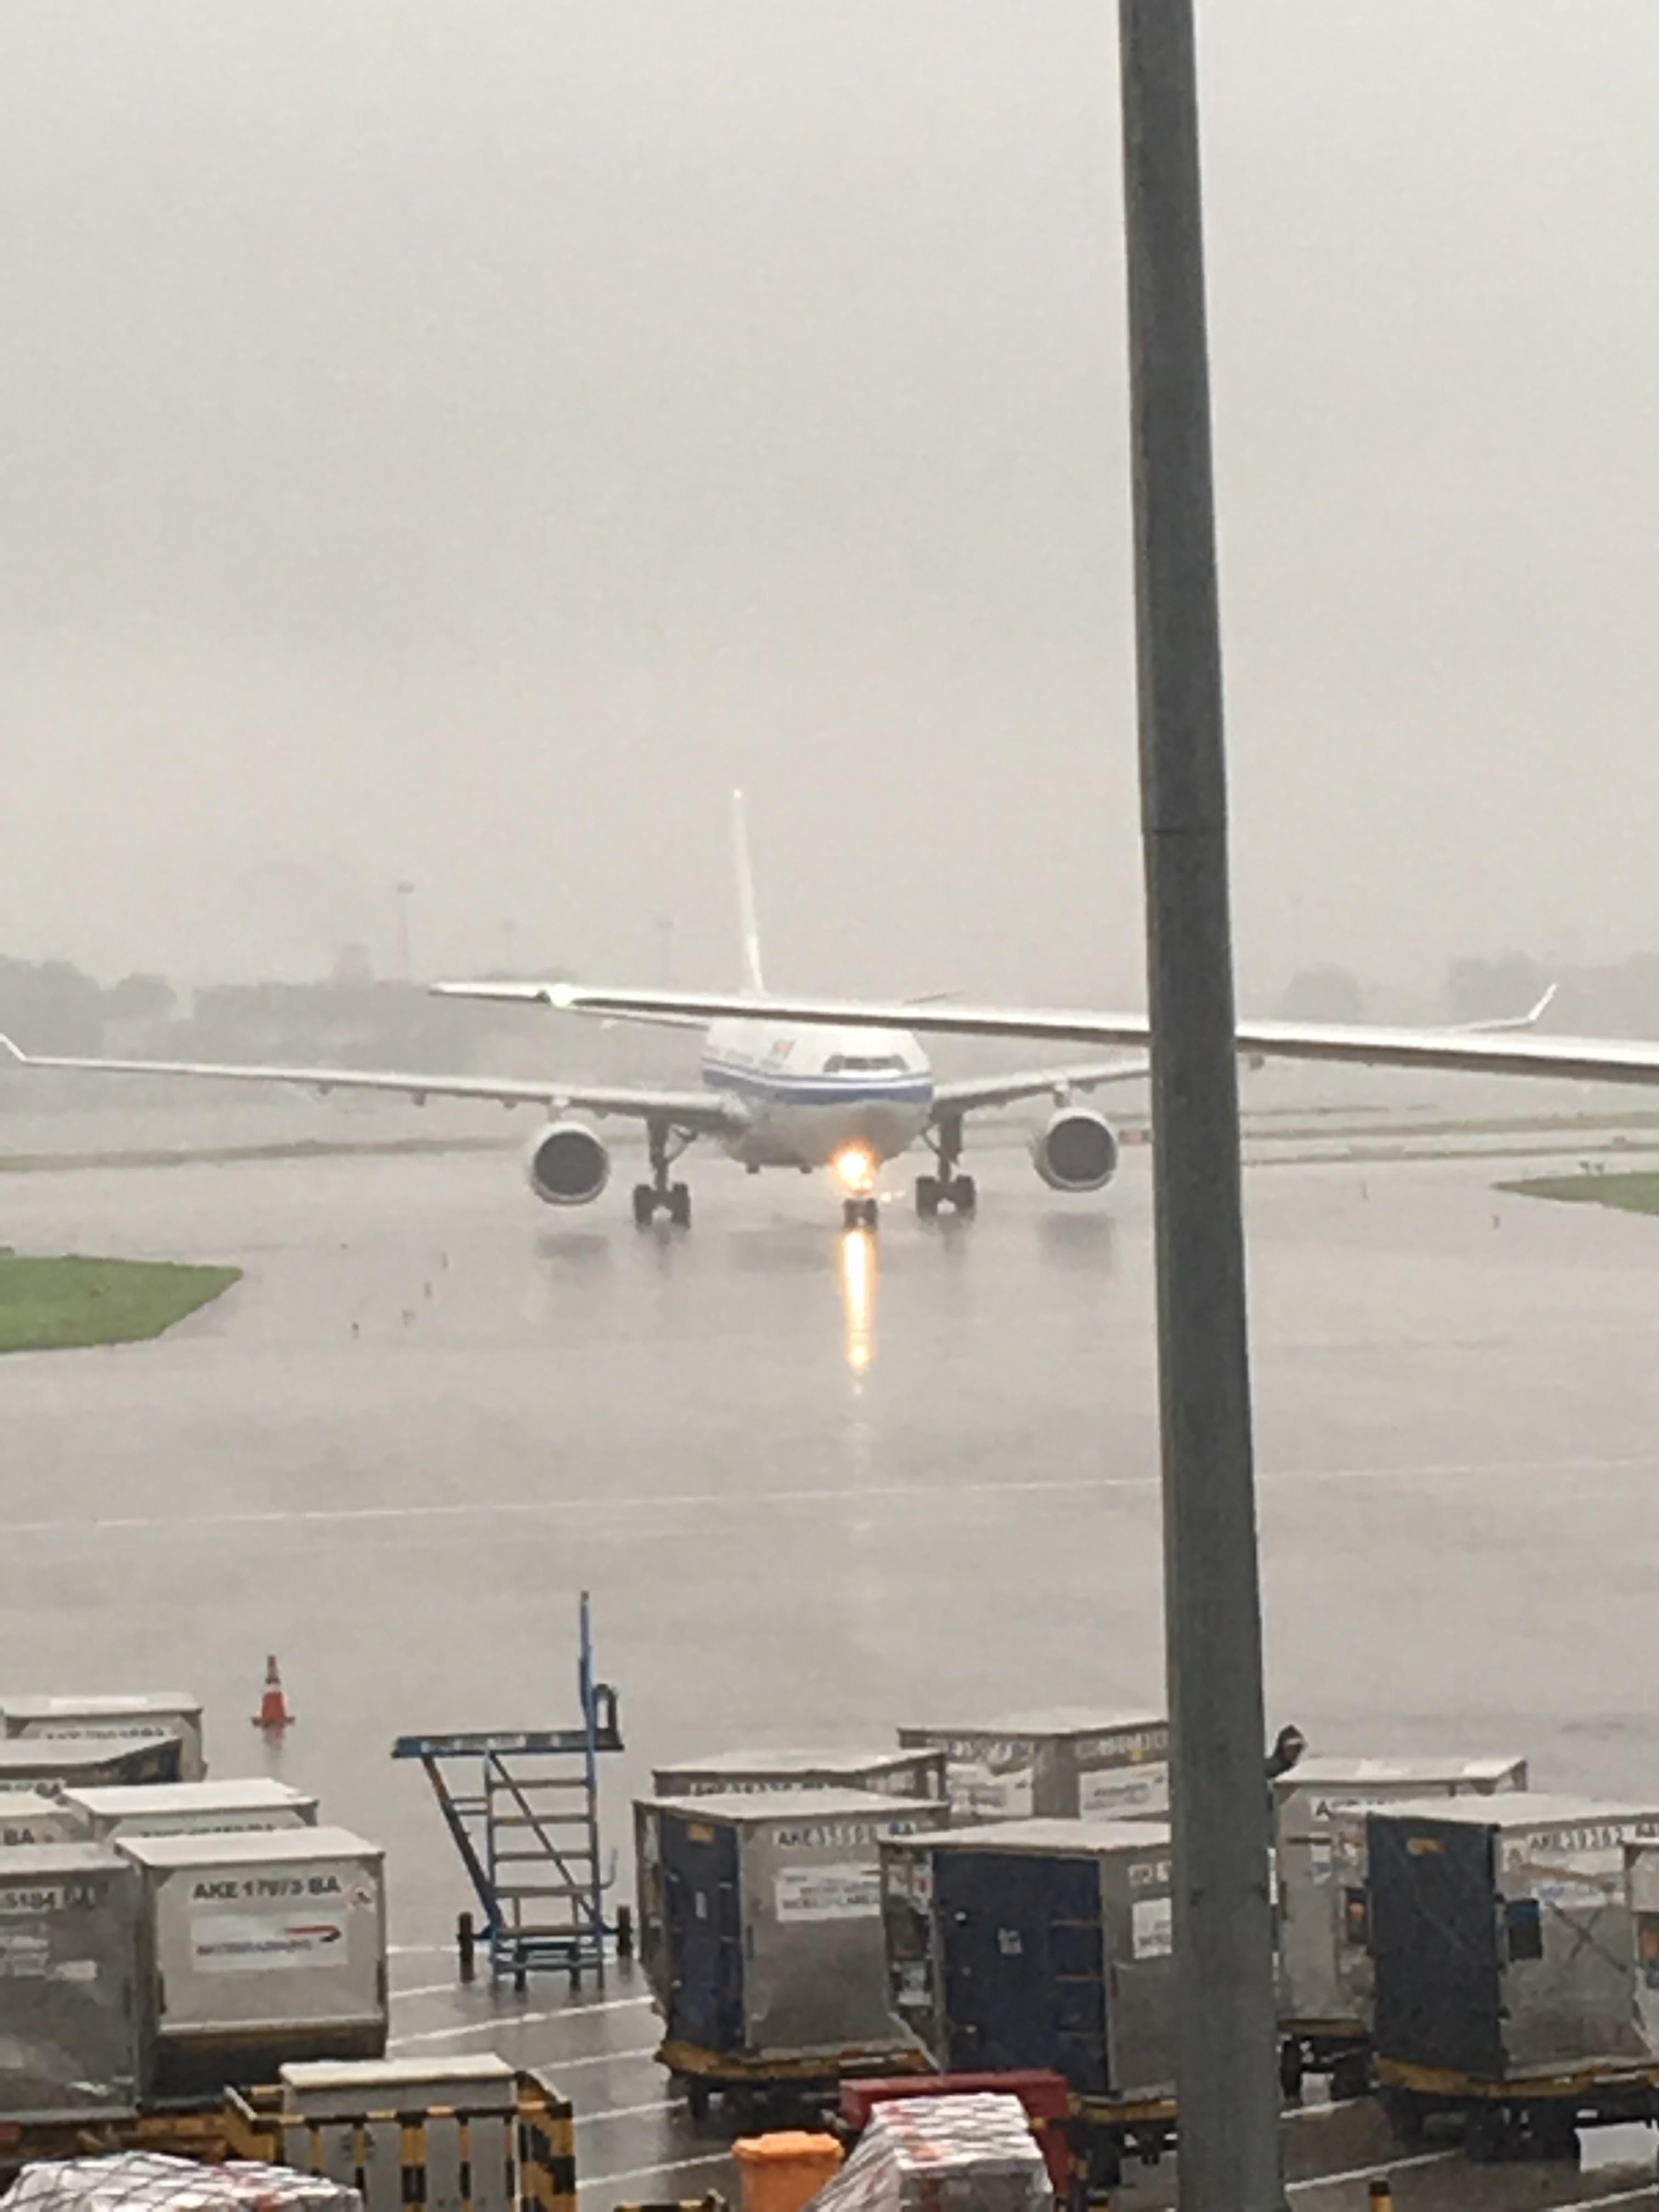 Re:[原创]~骚年飞行篇~补充半年前的香港之路,国航CA111 PEK-HKG,有幸坐到大擦第50架77W AIRBUS A330-300 B-5977 中国北京首都国际机场